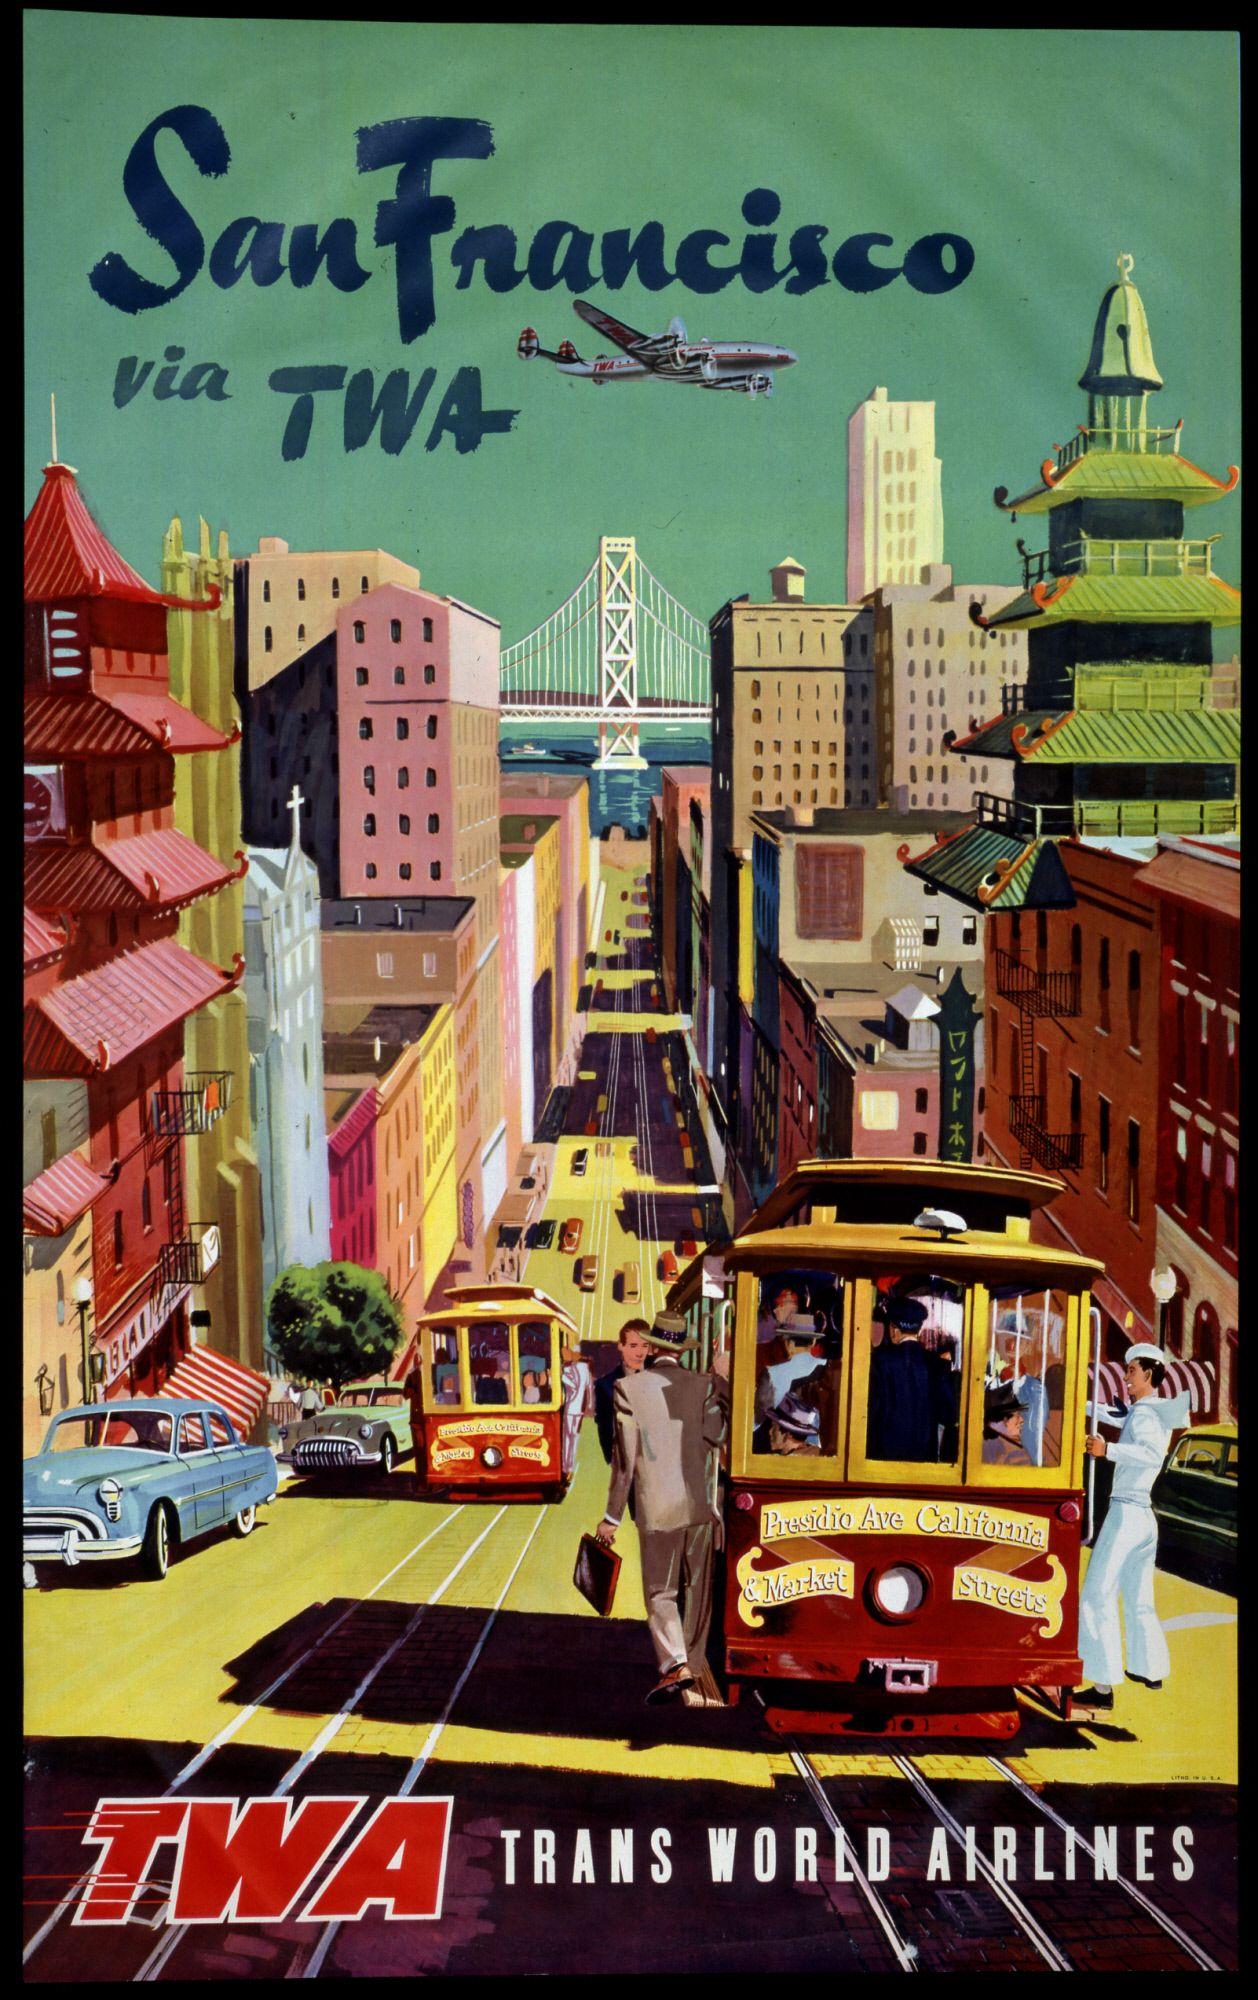 1960/'s San Francisco China Town Vintage Travel Poster 18x24